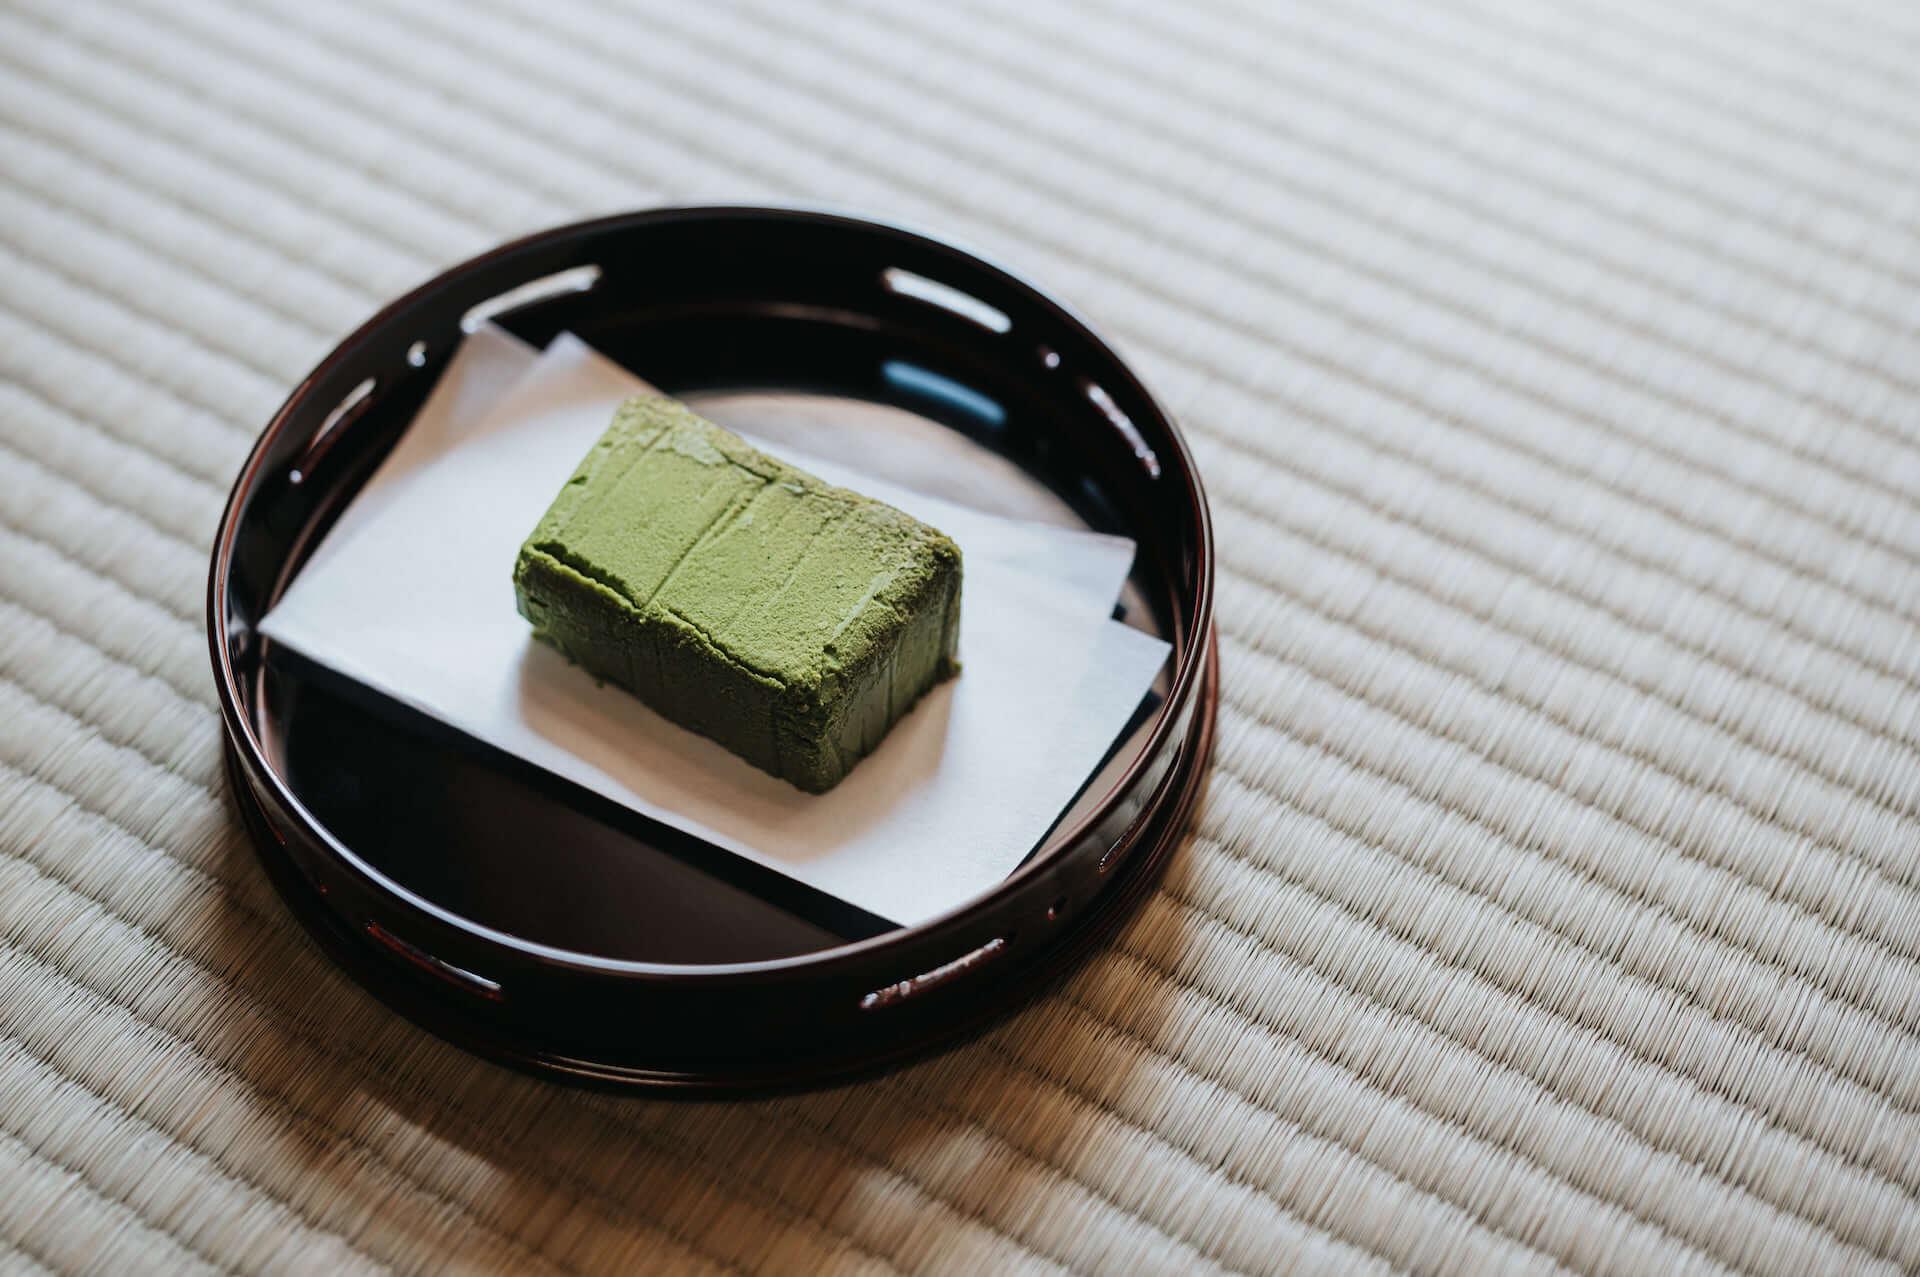 Mr. CHEESECAKE誕生3周年記念!希少な抹茶を使用したチーズケーキ『Mr. CHEESECAKE Oribe』が数量限定で登場 gourmet210322_mrcheesecake-tearoom_2-1920x1277